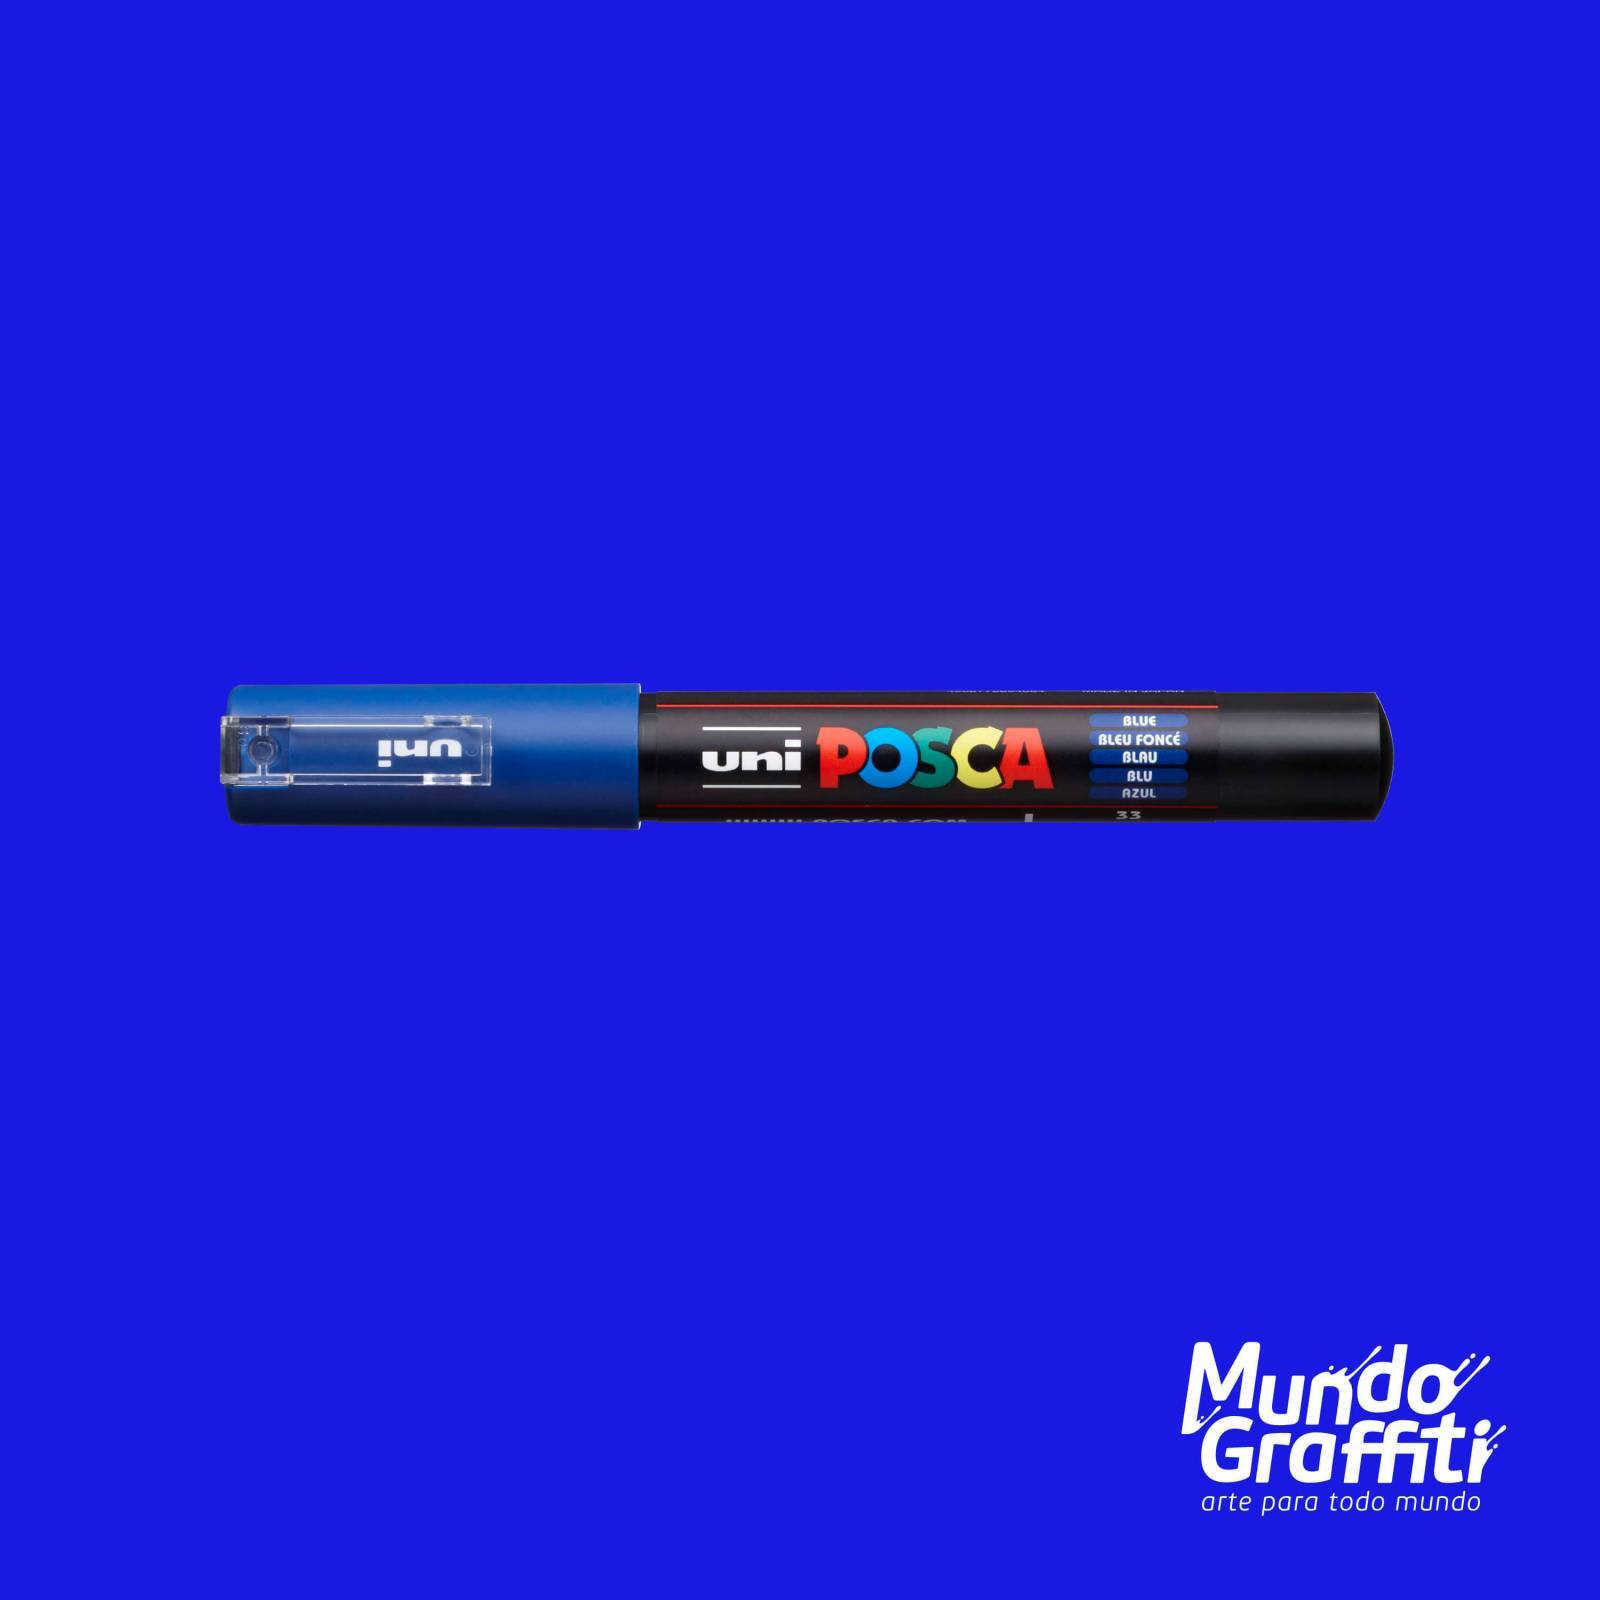 Caneta Posca 1M Azul - Mundo Graffiti